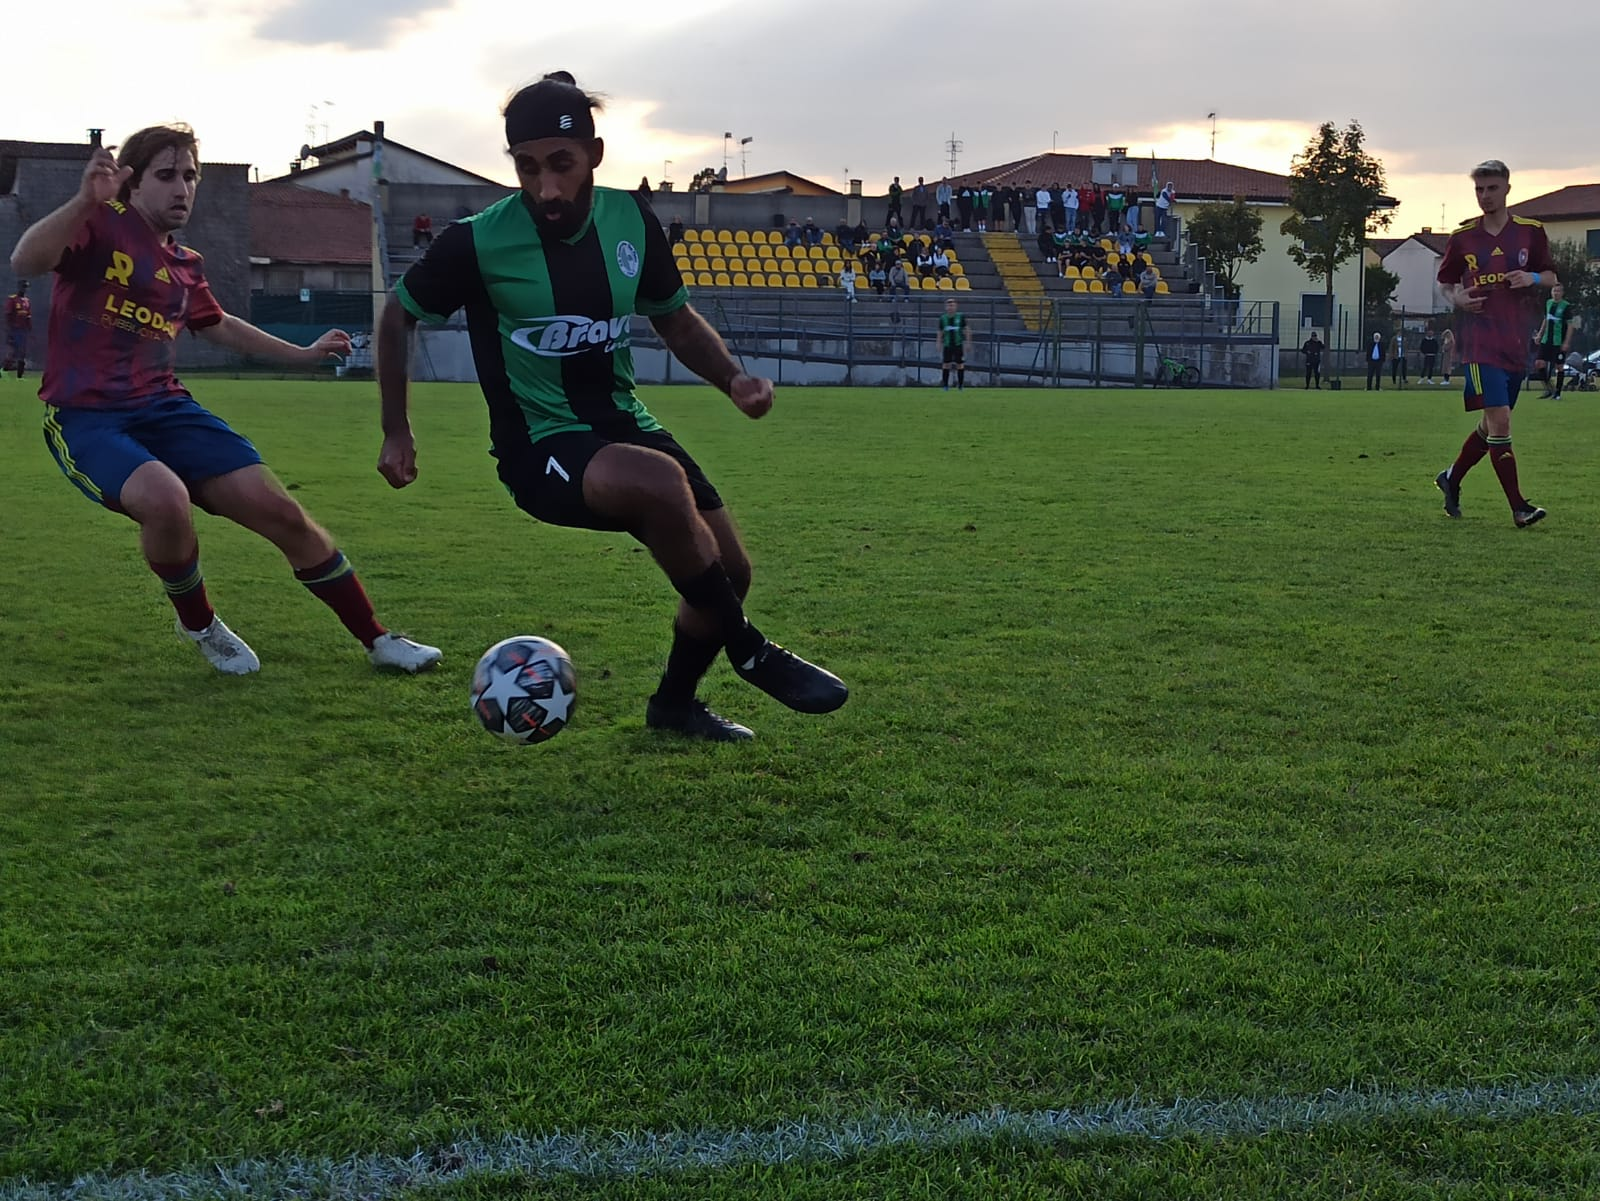 GS San Pietro 7-0 San Lazzaro   Riassunto – Arriva la prima vittoria!